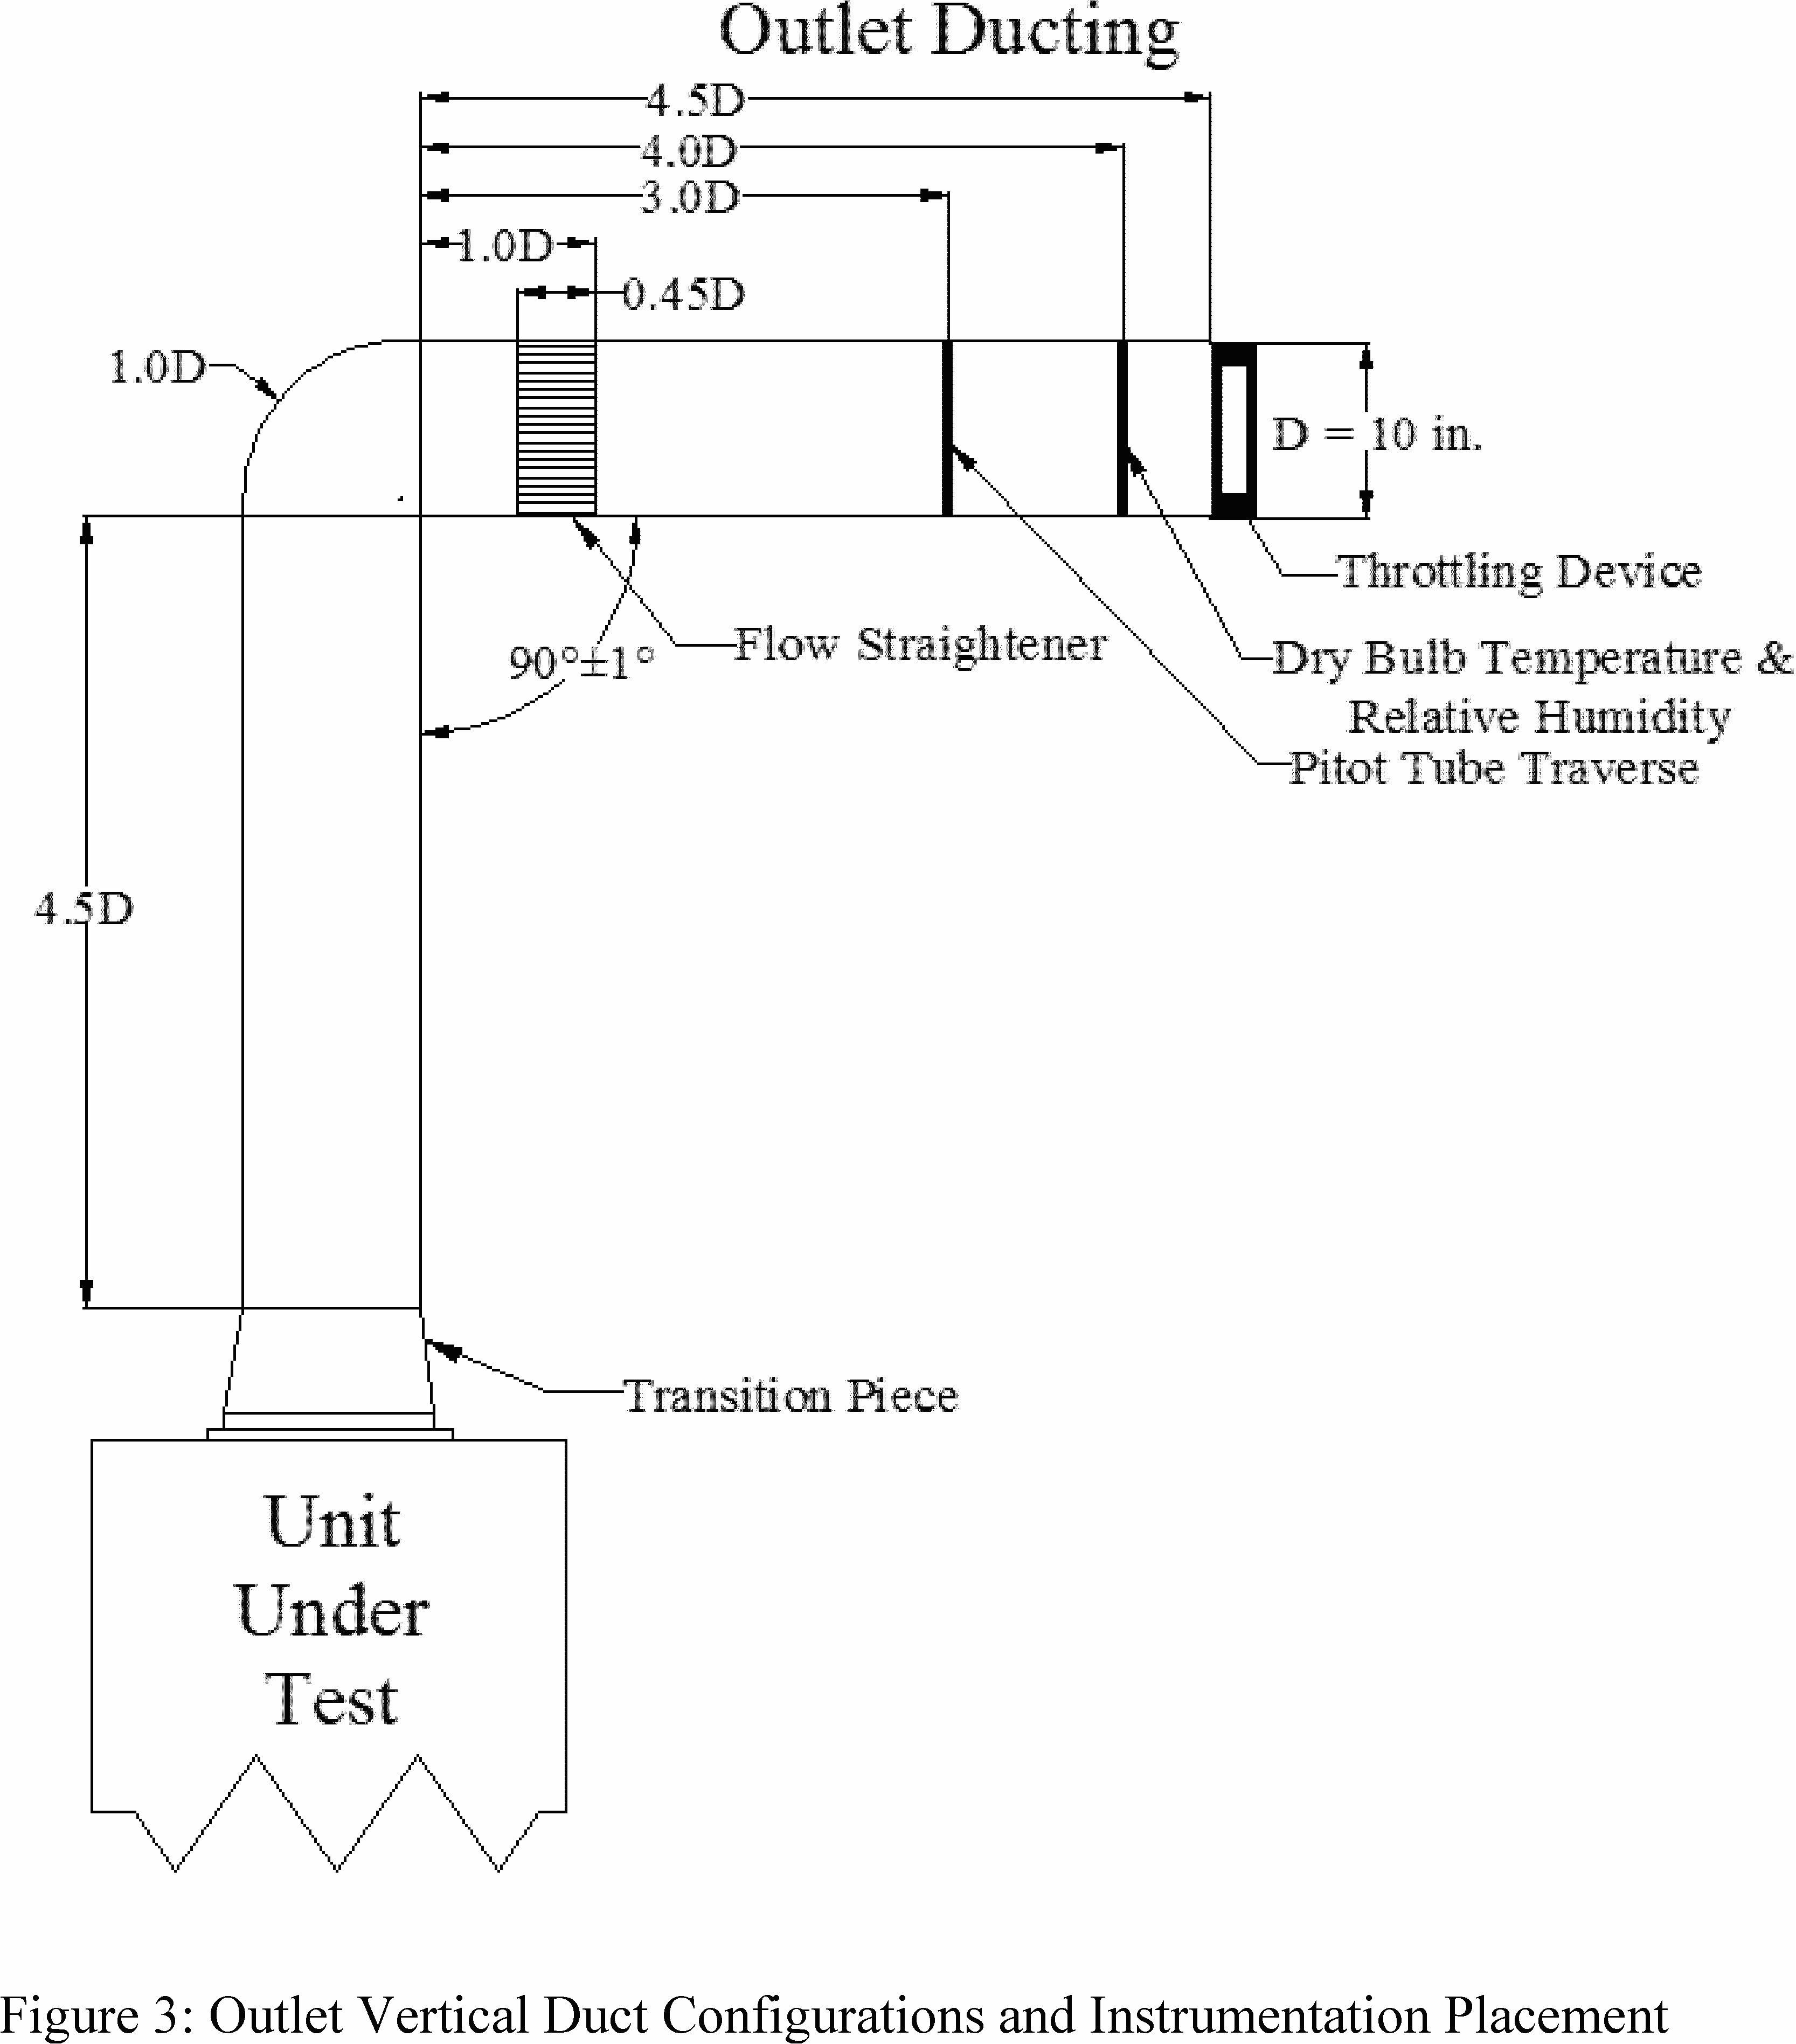 wiring diagram air conditioning compressor unique refrigerator pressor wiring of wiring diagram air conditioning compressor png